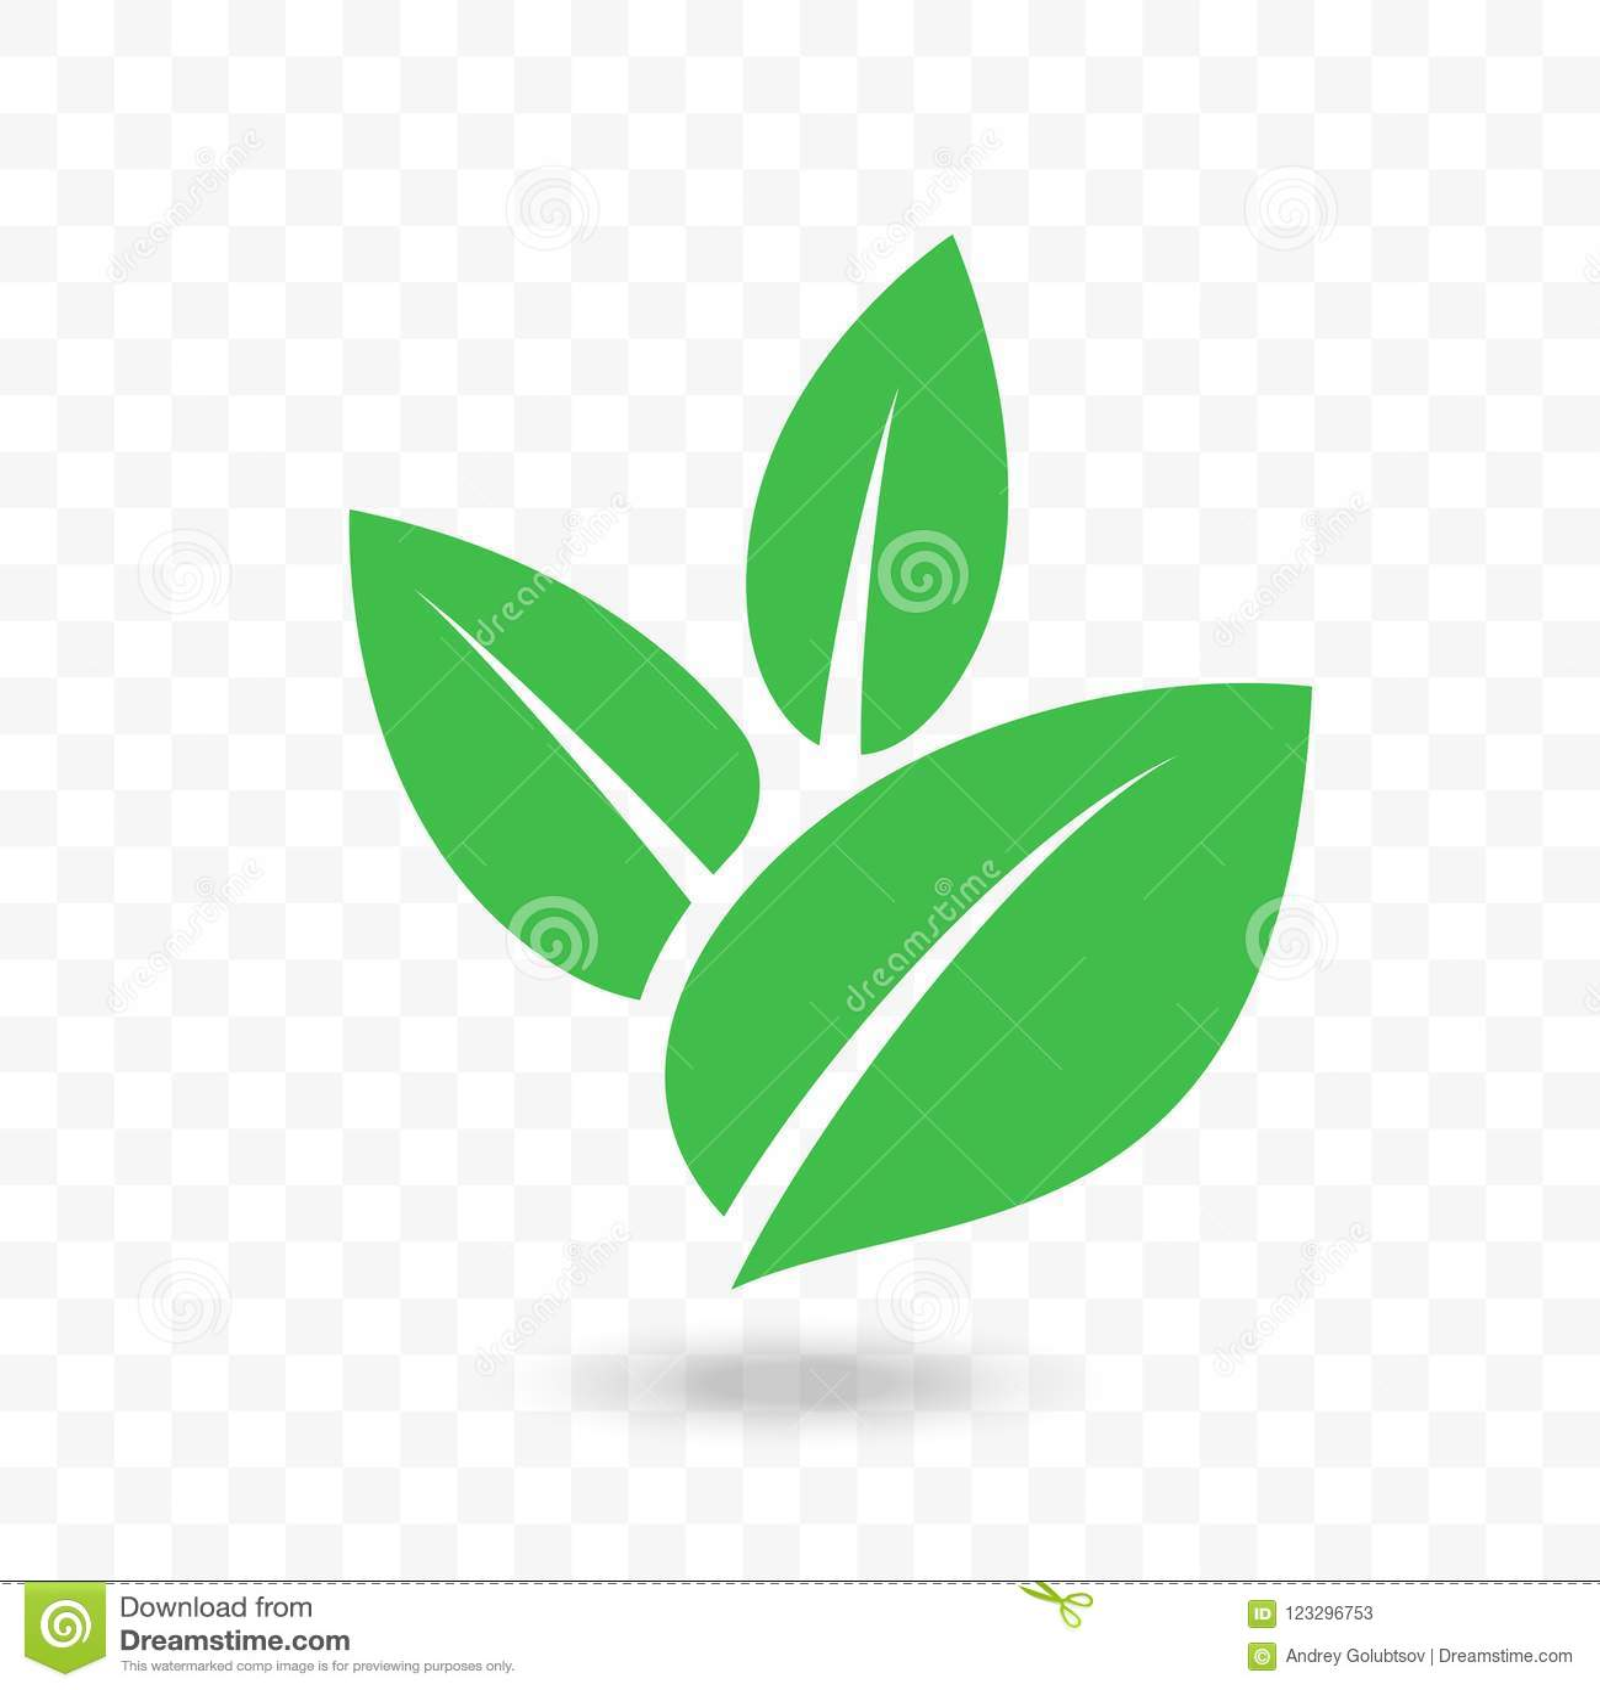 Green Leaf Vector Icon For Vegan, Bio Eco Design Stock Vector